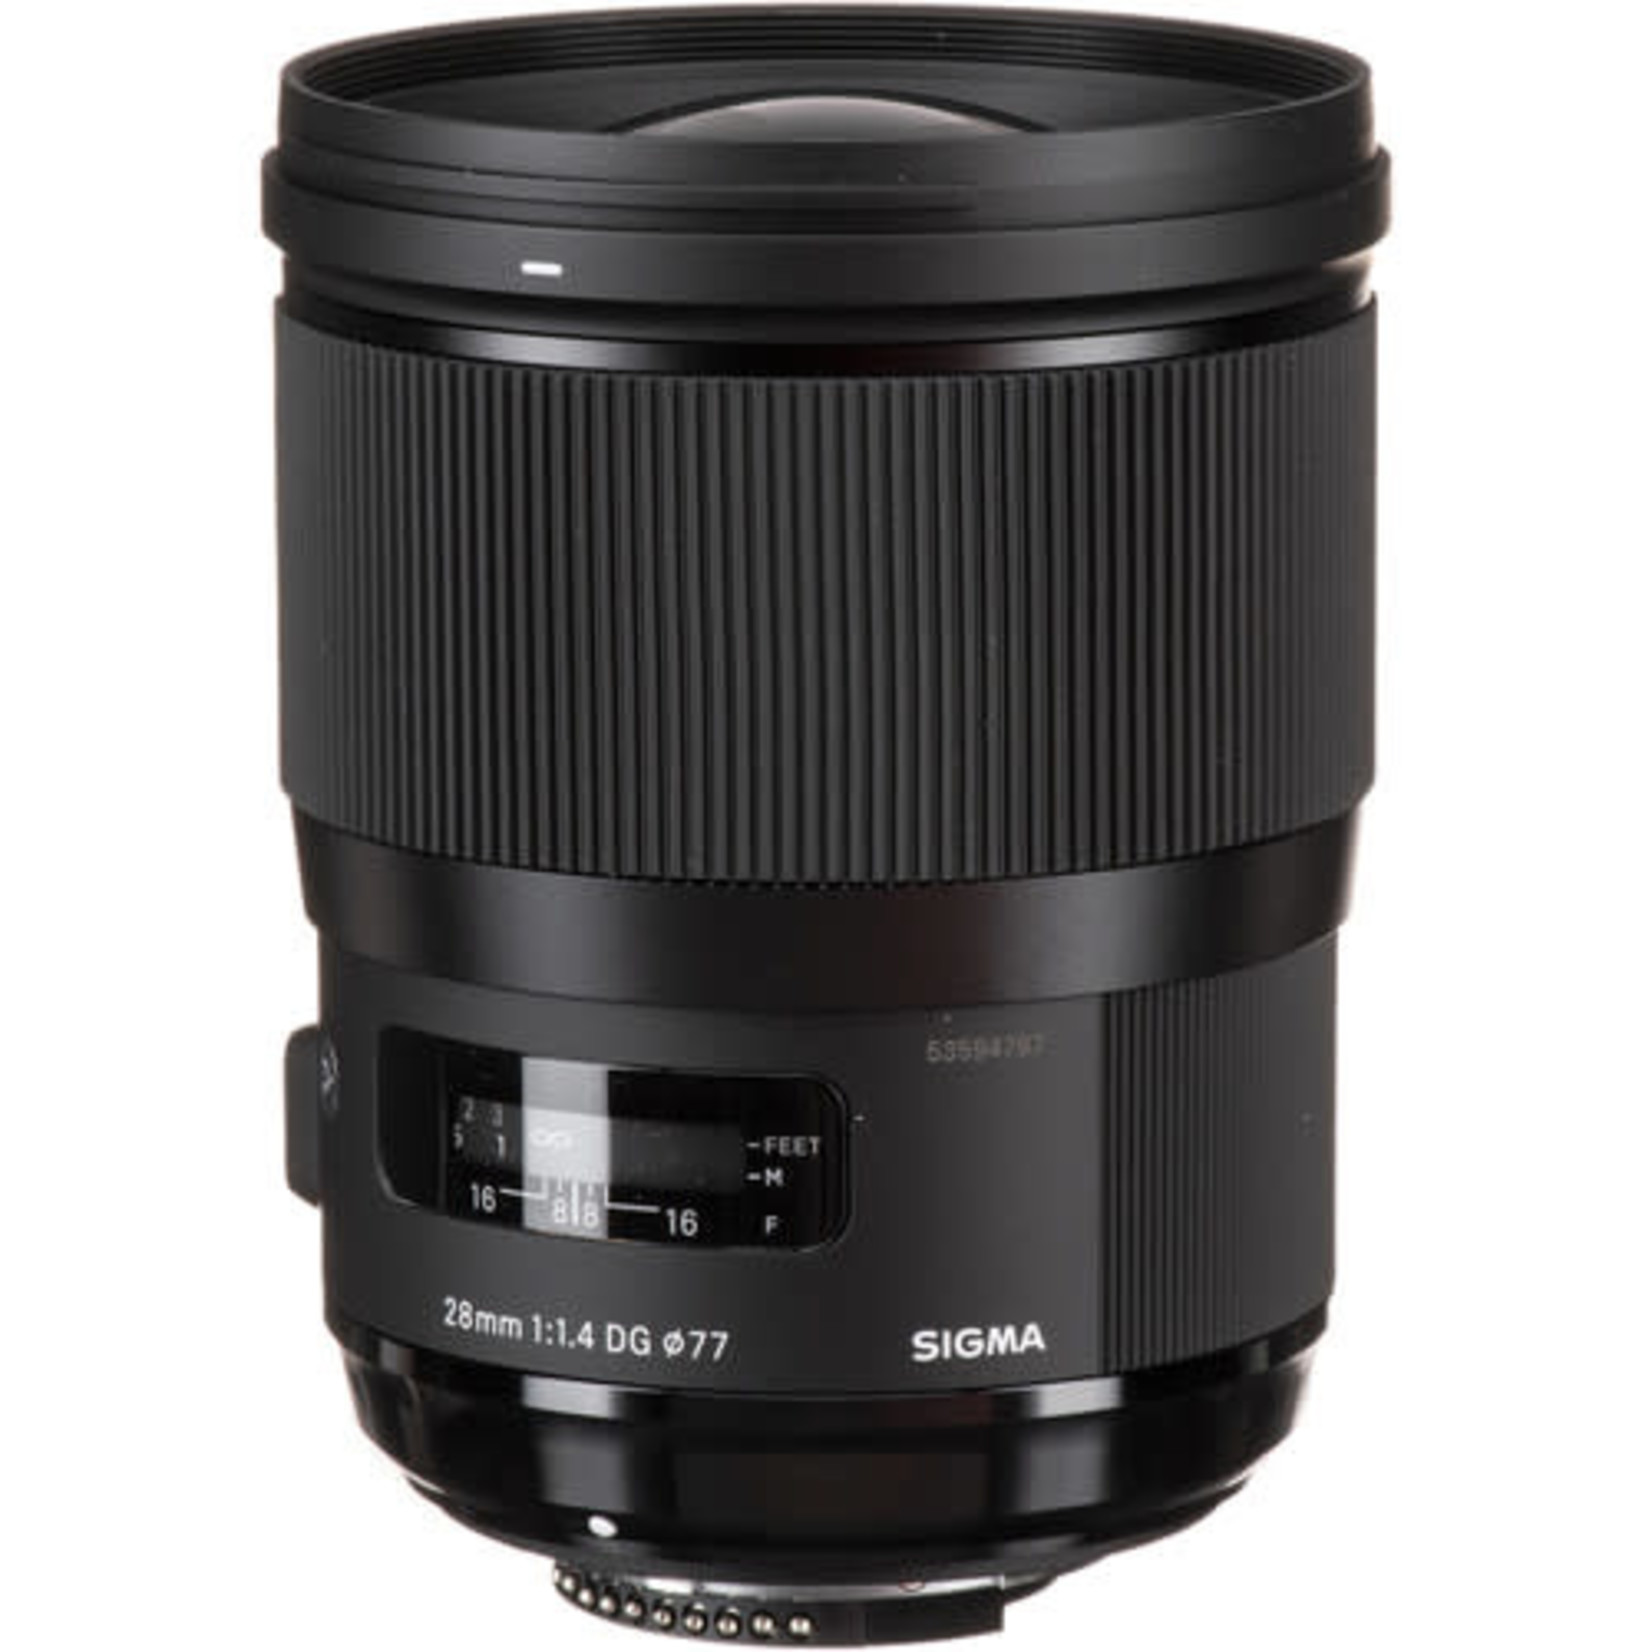 Sigma Sigma 28mm f/1.4 DG HSM Art Lens for Nikon F